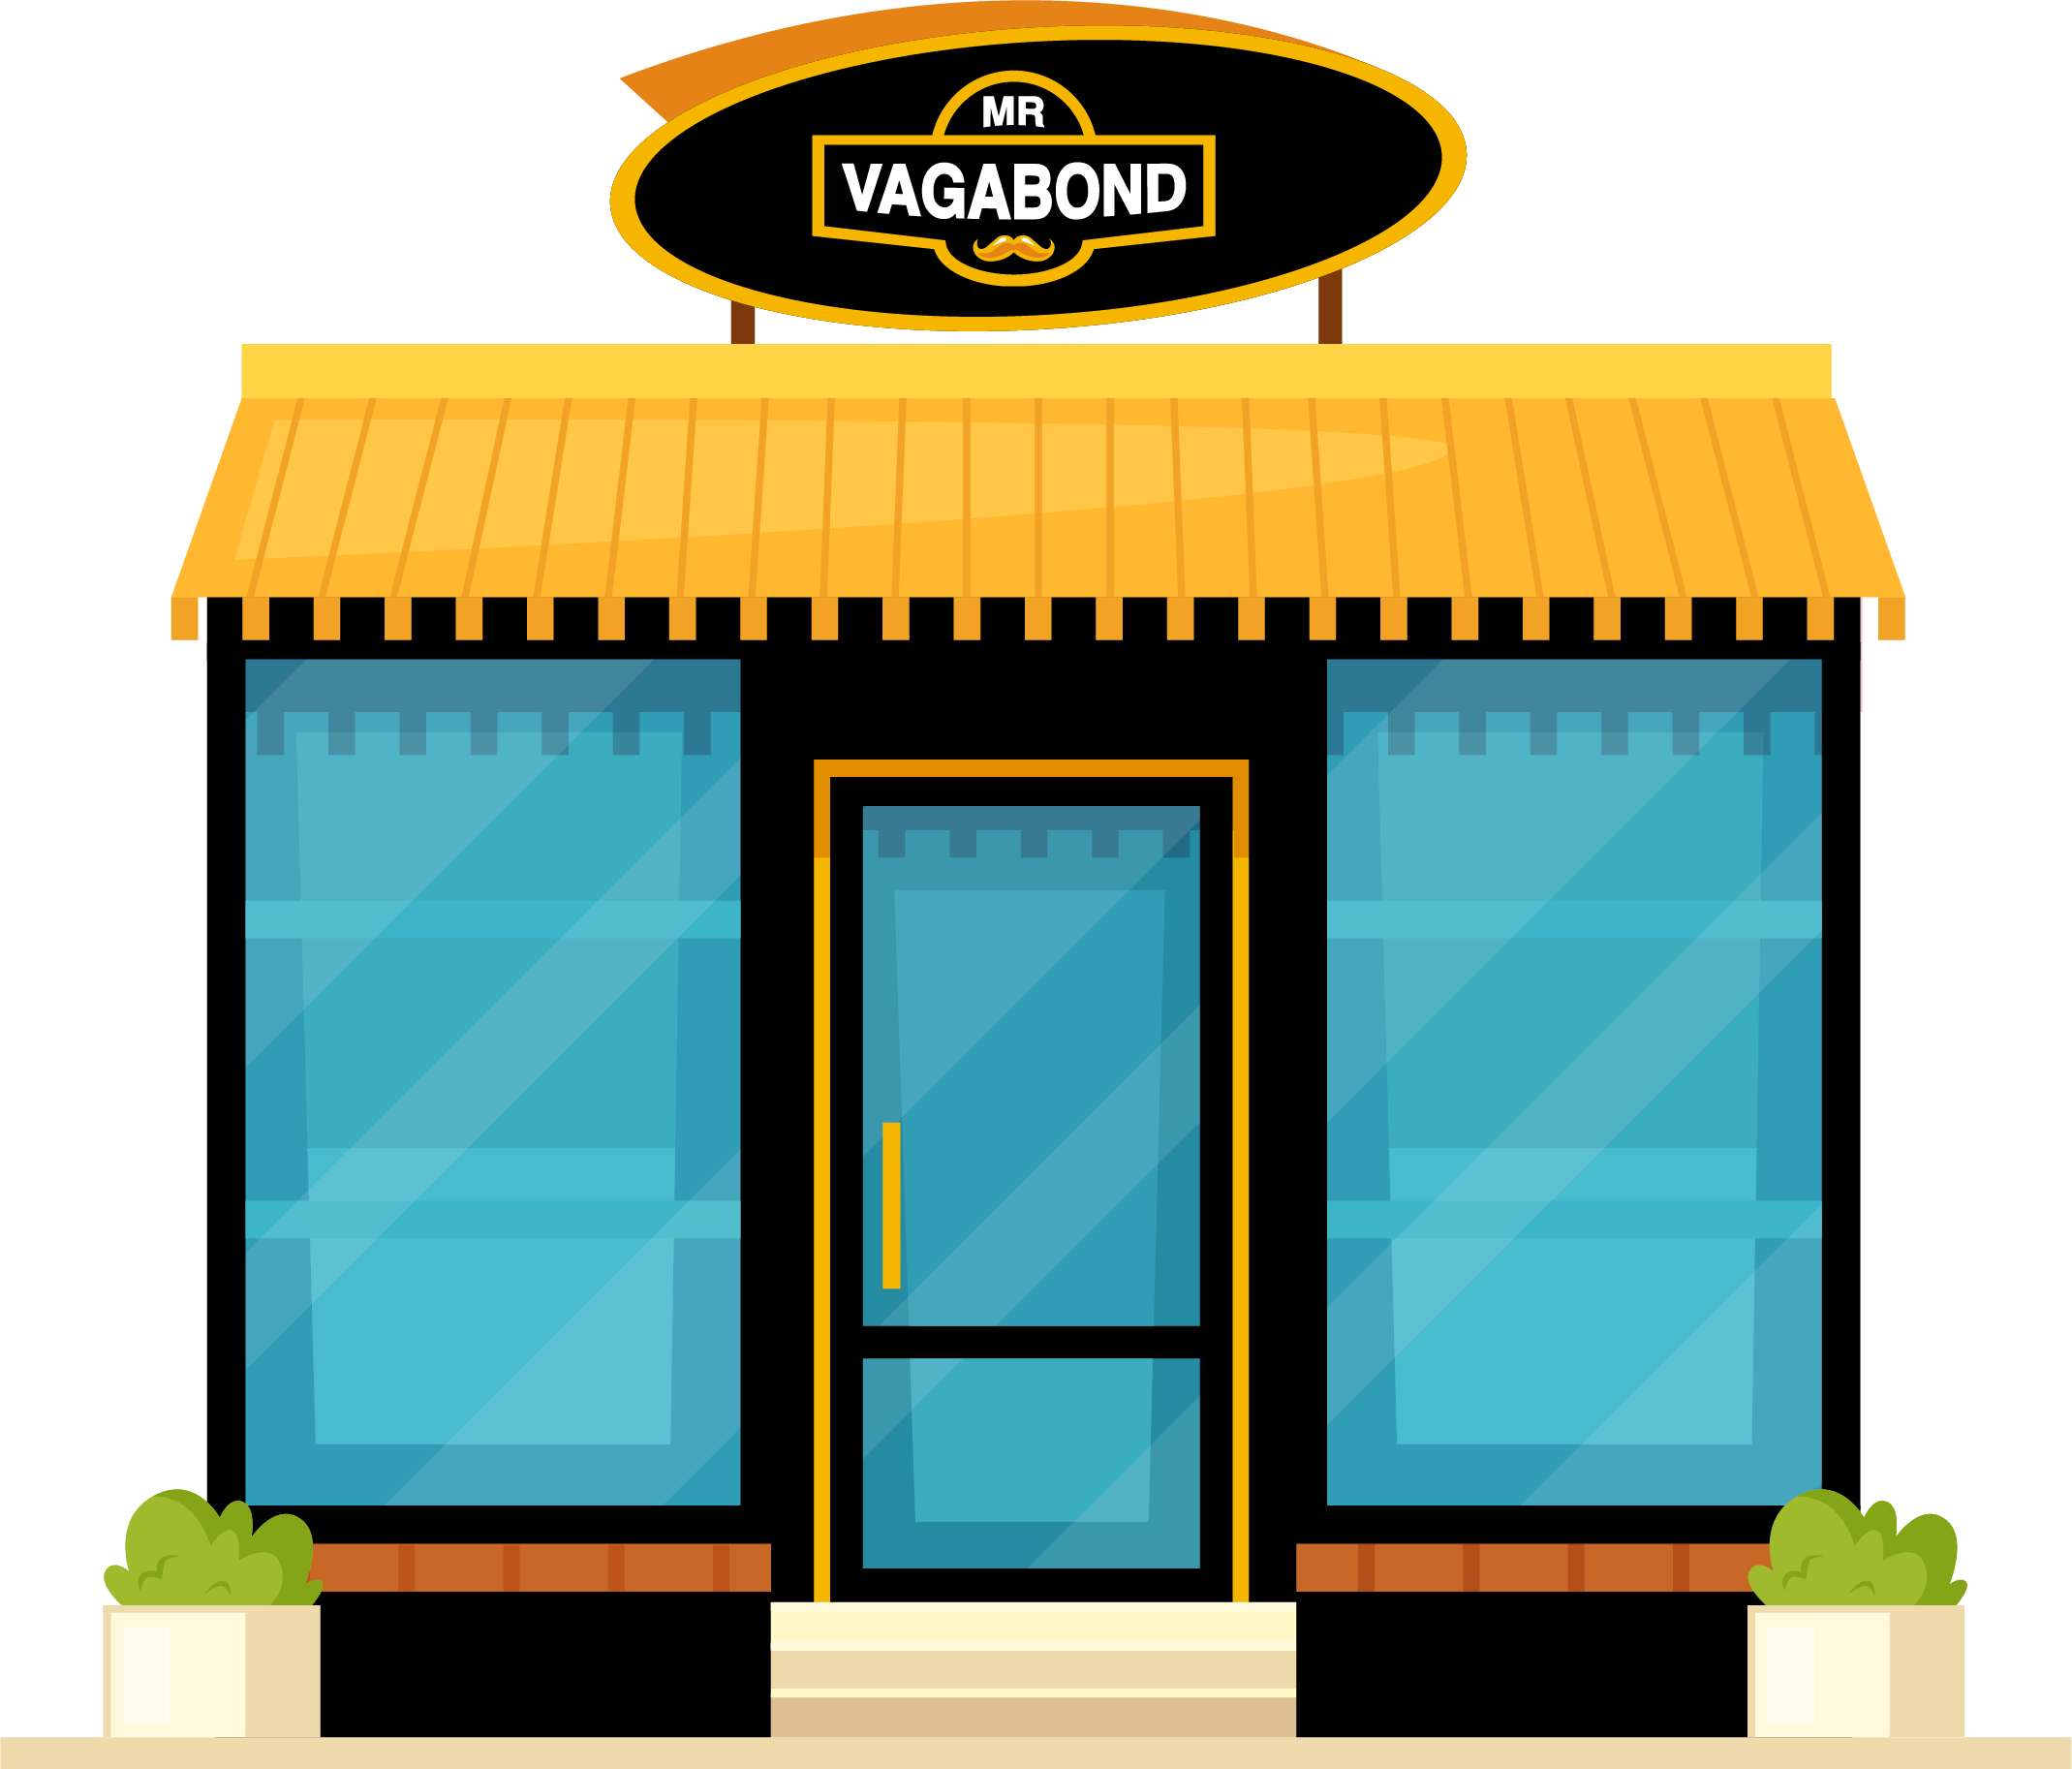 Restaurant Mr Vagabond